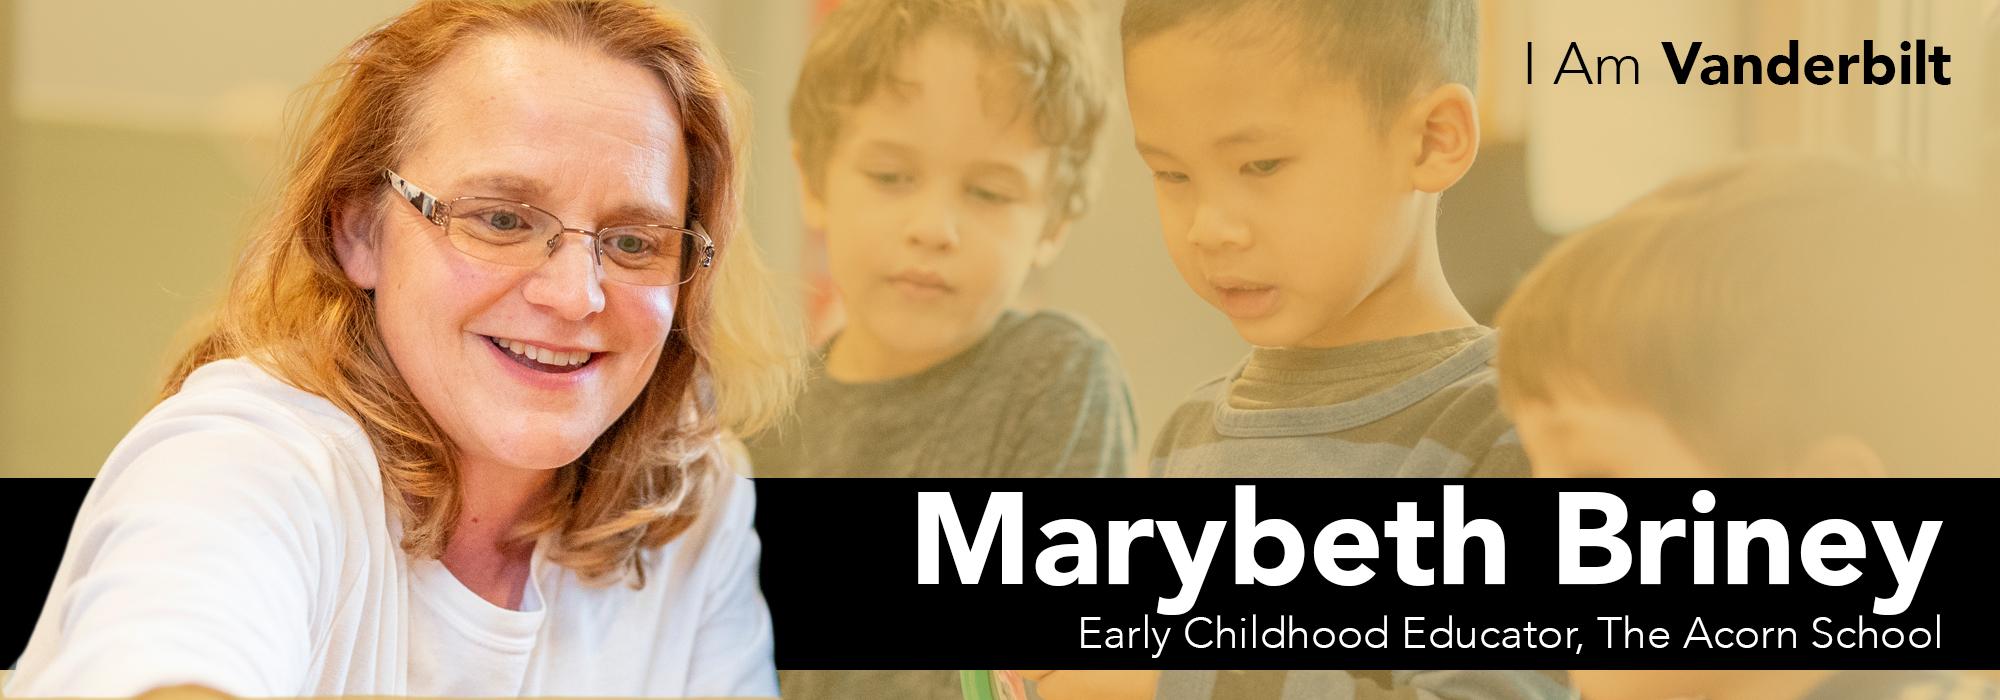 I Am Vanderbilt: Marybeth Briney